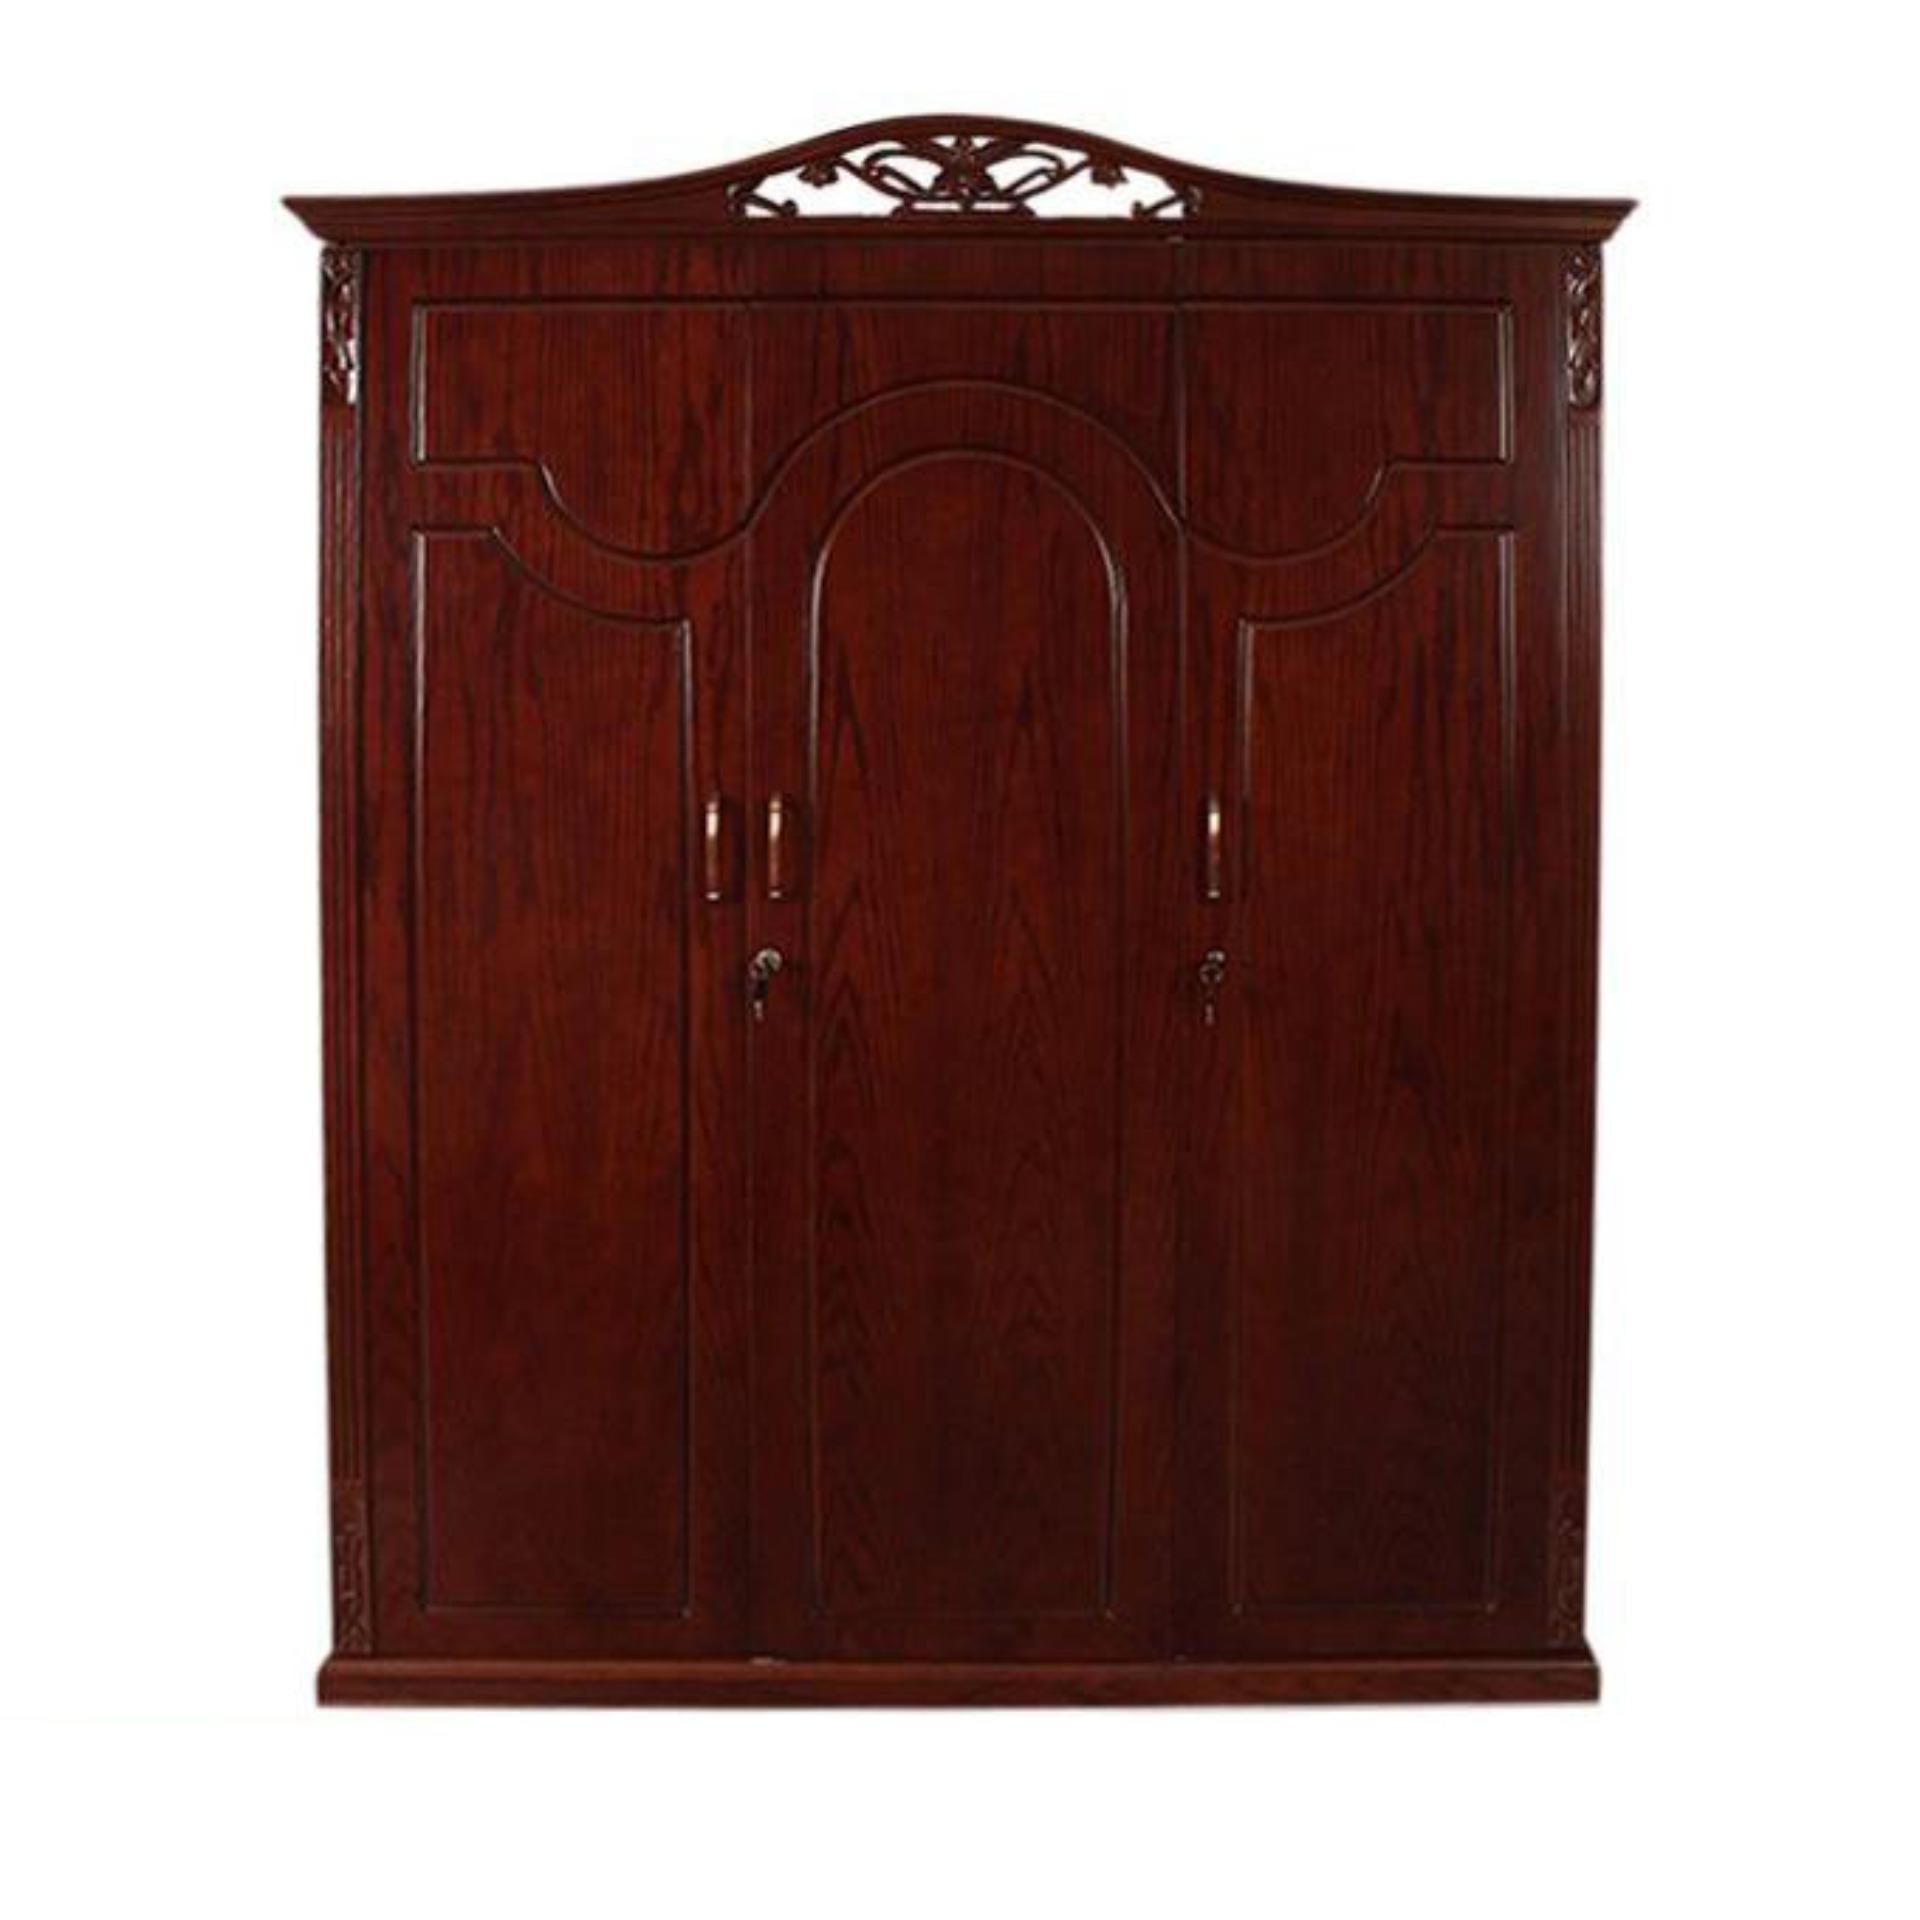 P200 360 oak wood and oak veneer 3 doors magnolia almirah brown buy online at best prices in bangladesh daraz com bd